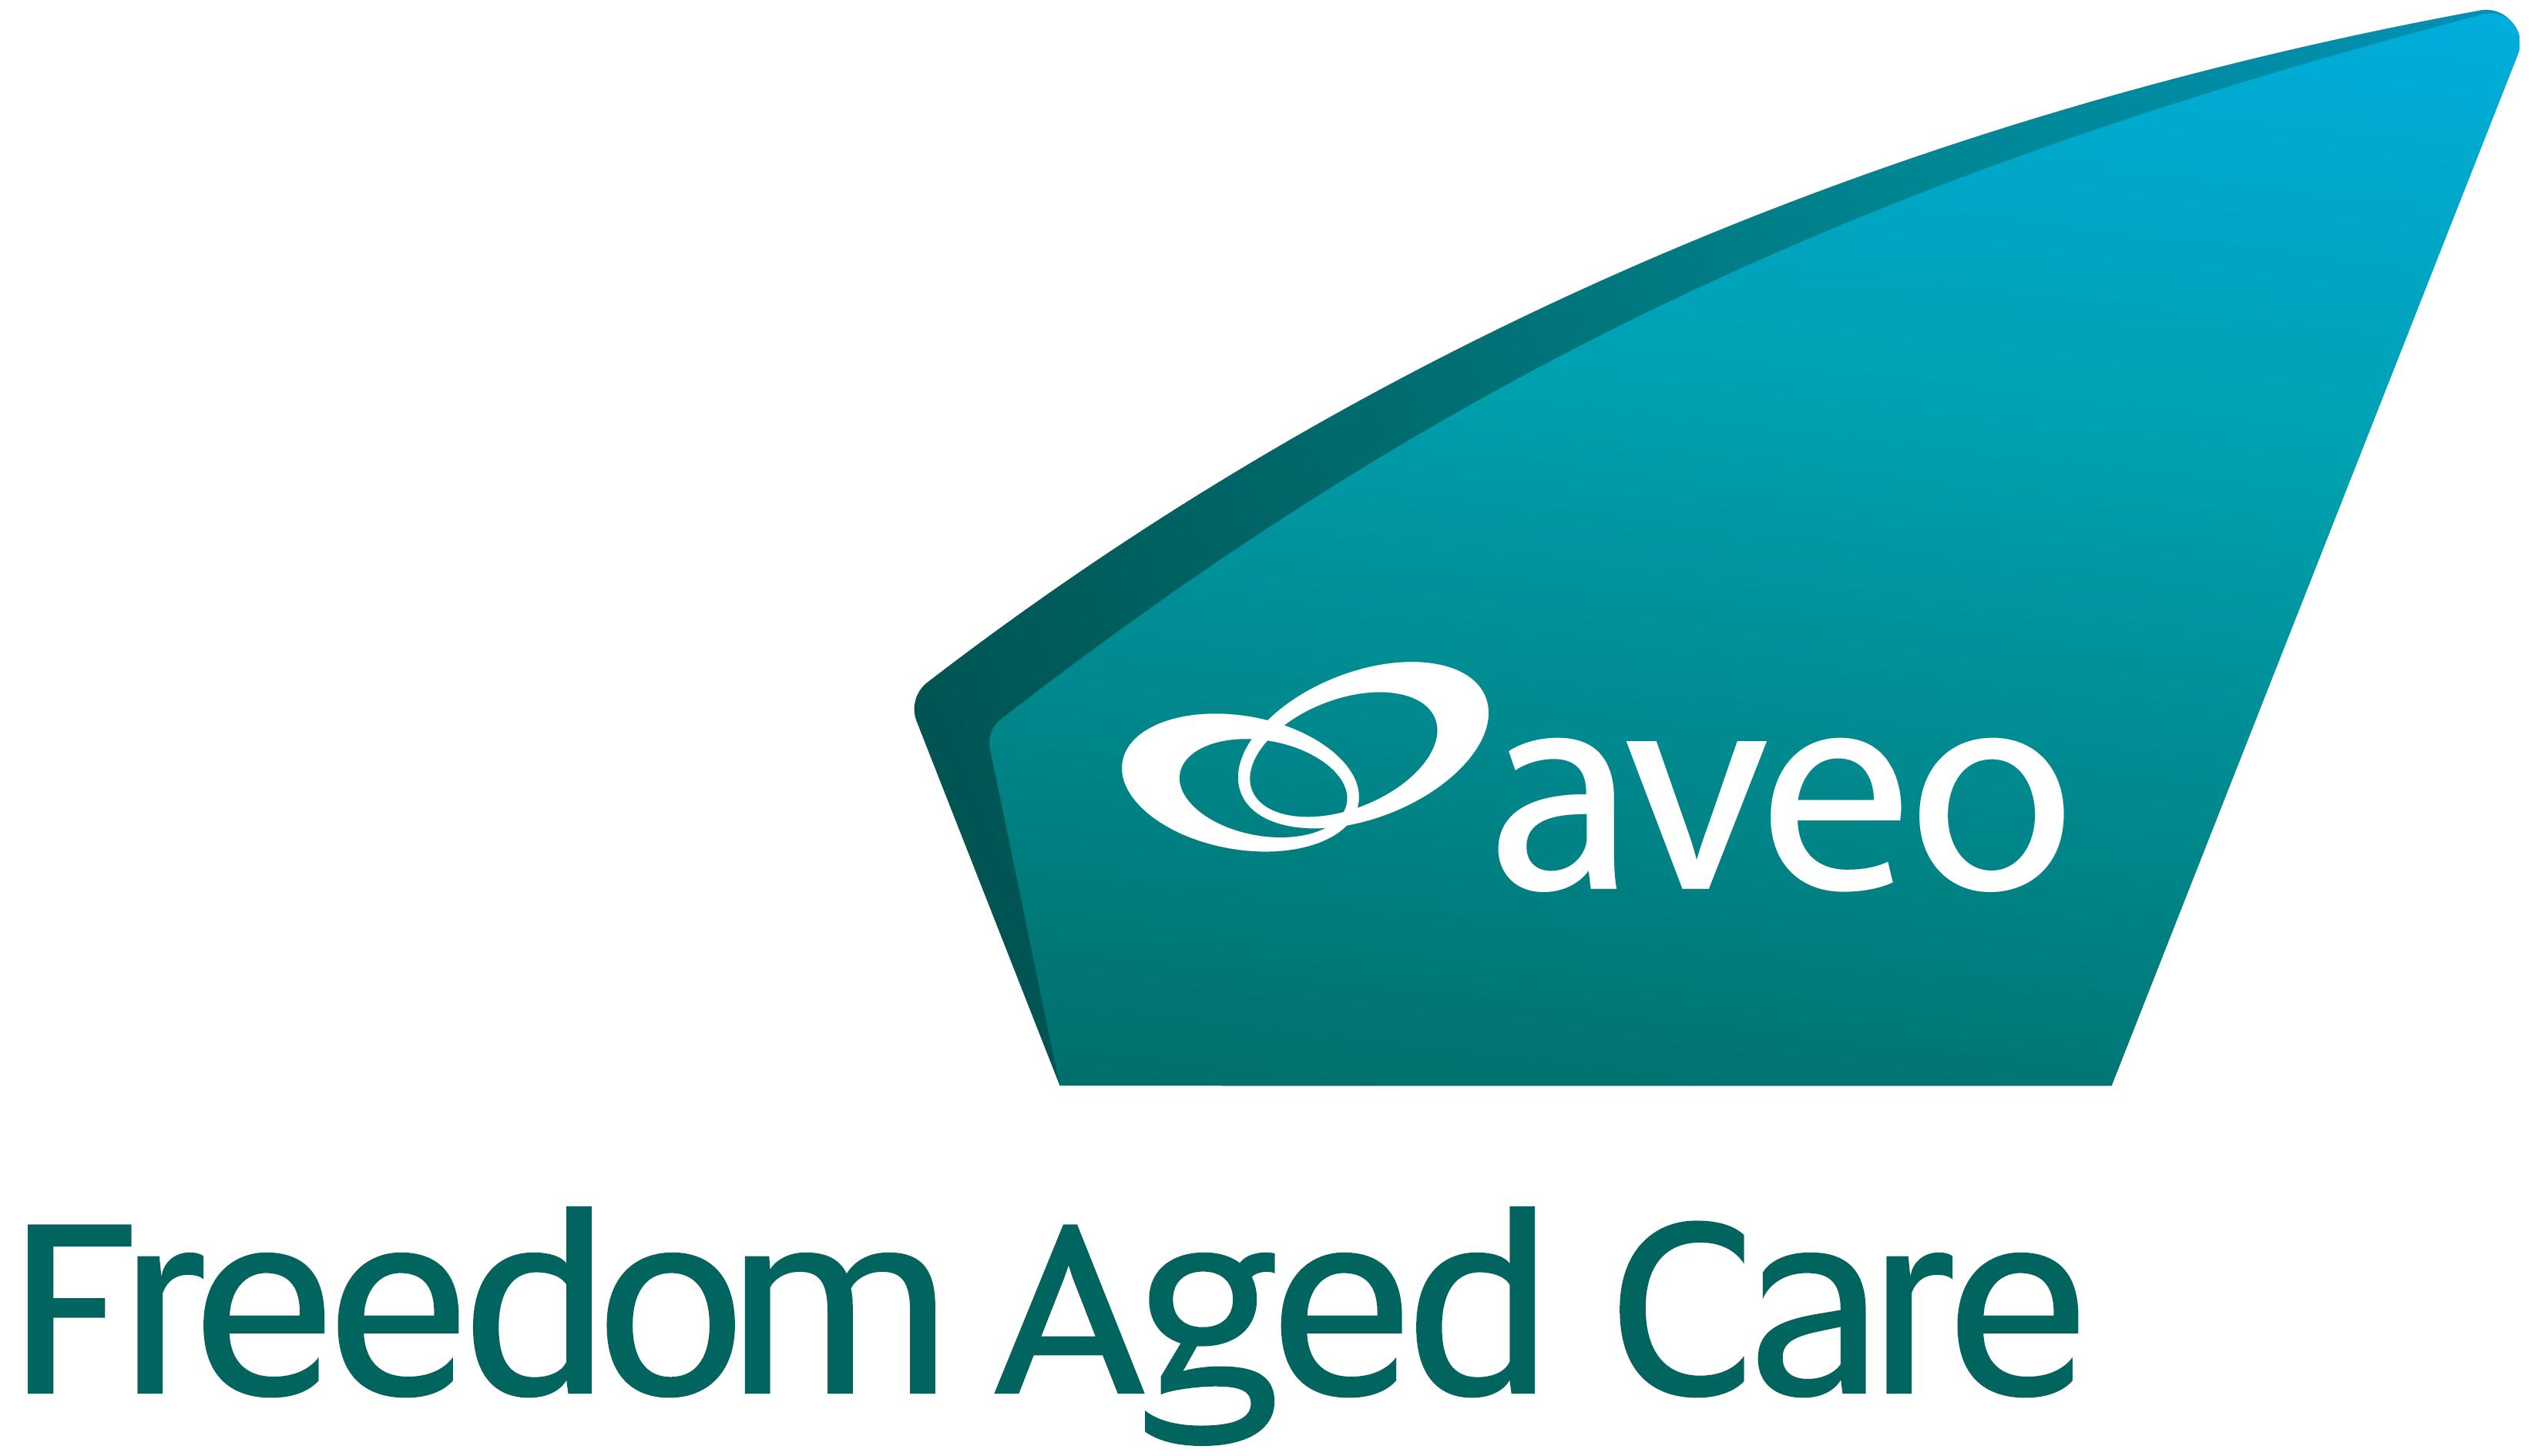 Aveo Freedom Aged Care Cheltenham logo